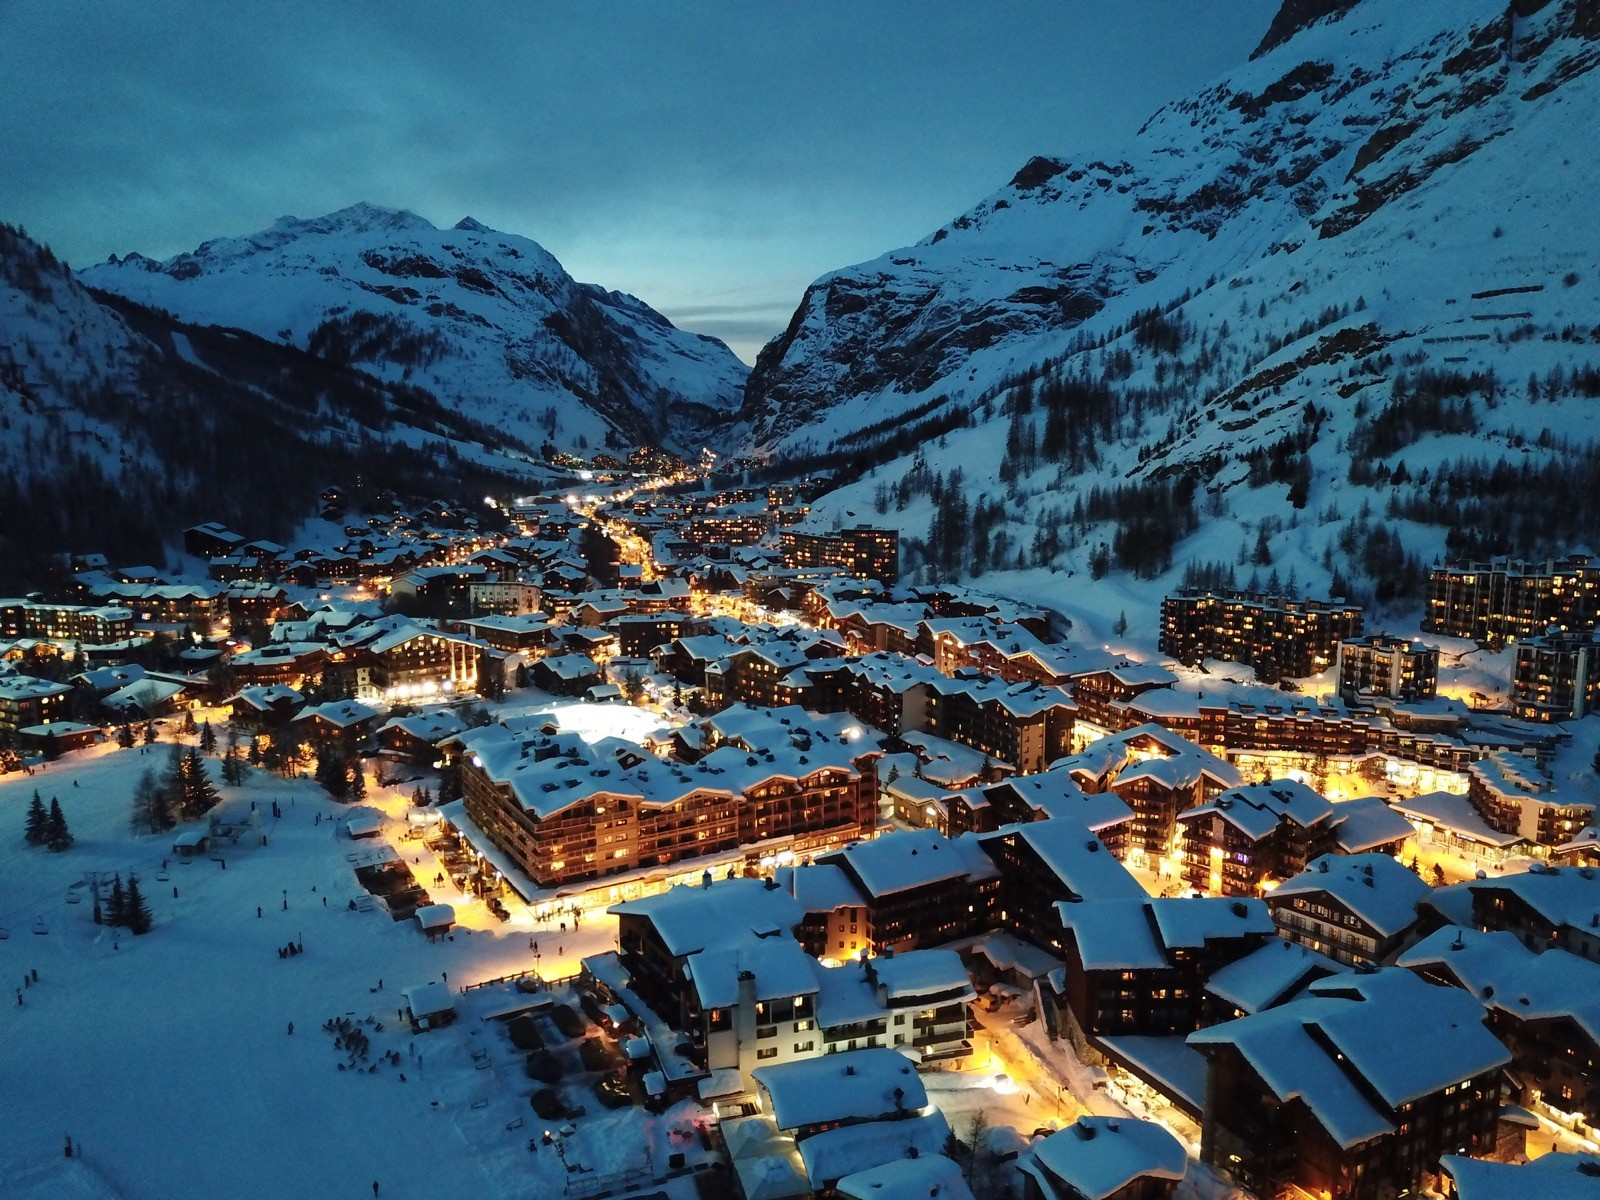 Val d'Isere carbon footprint